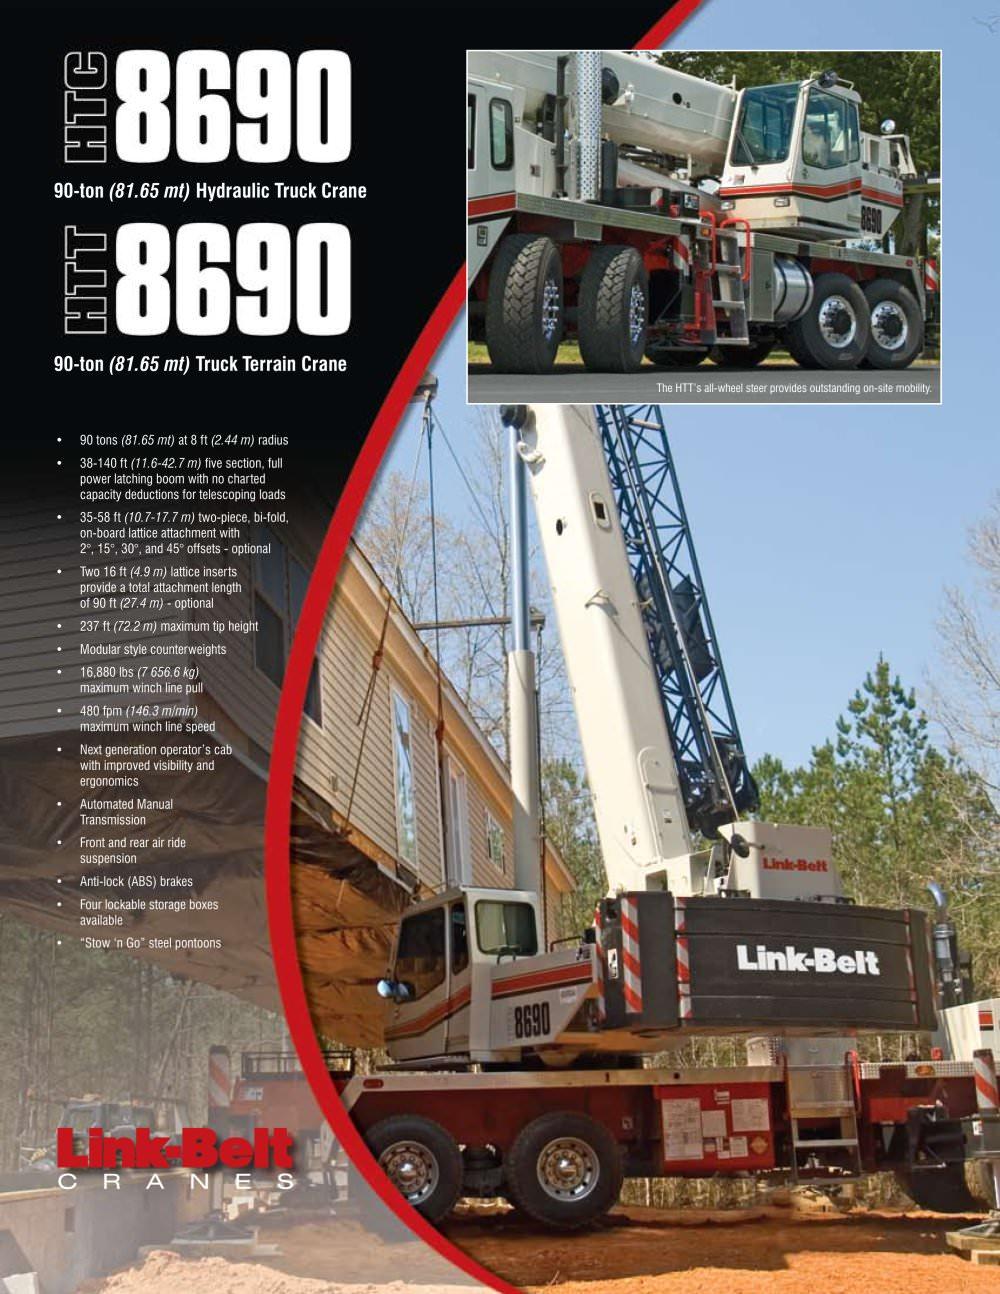 link belt htc 8690 90 ton 81 6 mt hydraulic truck crane link rh pdf directindustry com Link Belt Parts Power Twist Link Belt